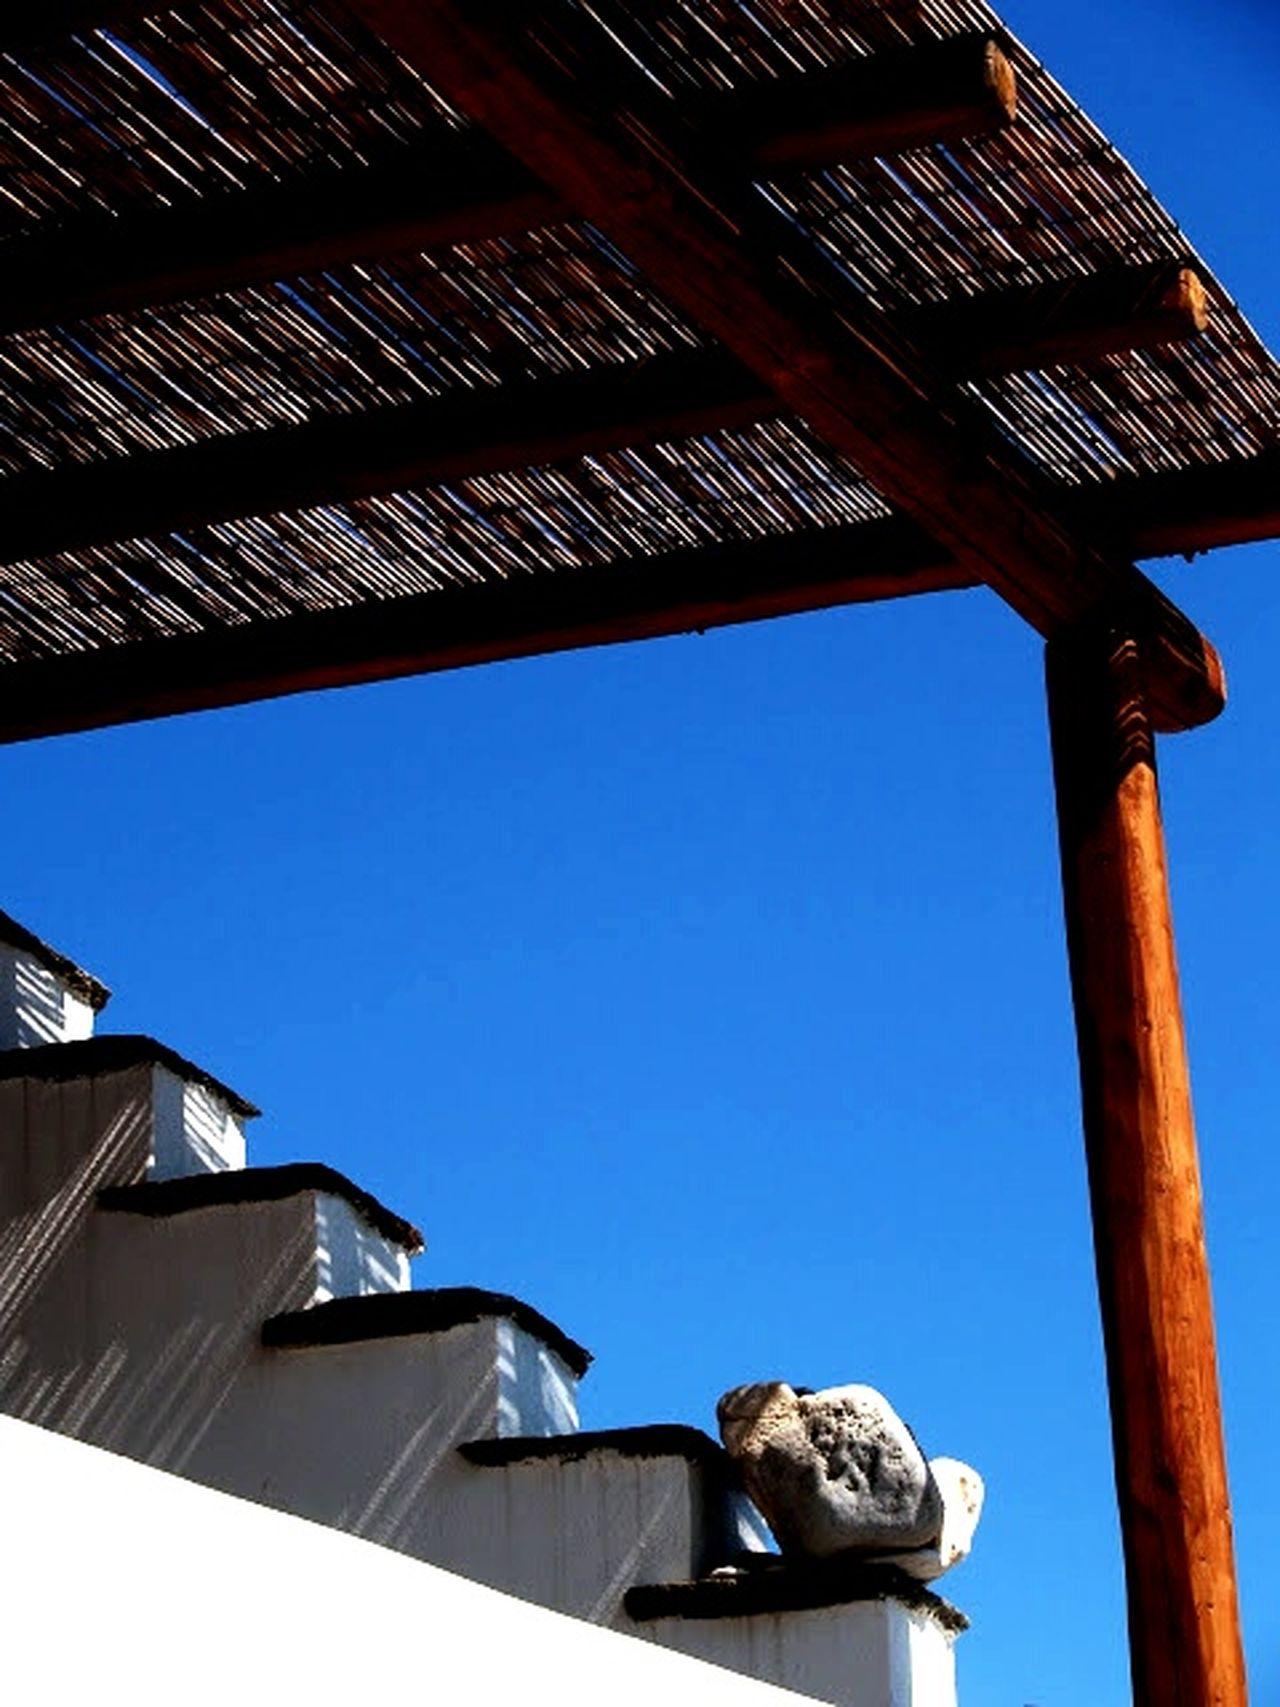 Greece Tinos Greece Summer Summer In Greece Blue Blue Sky Holidays Holidays In Greece ❤ Nuture Beutiful